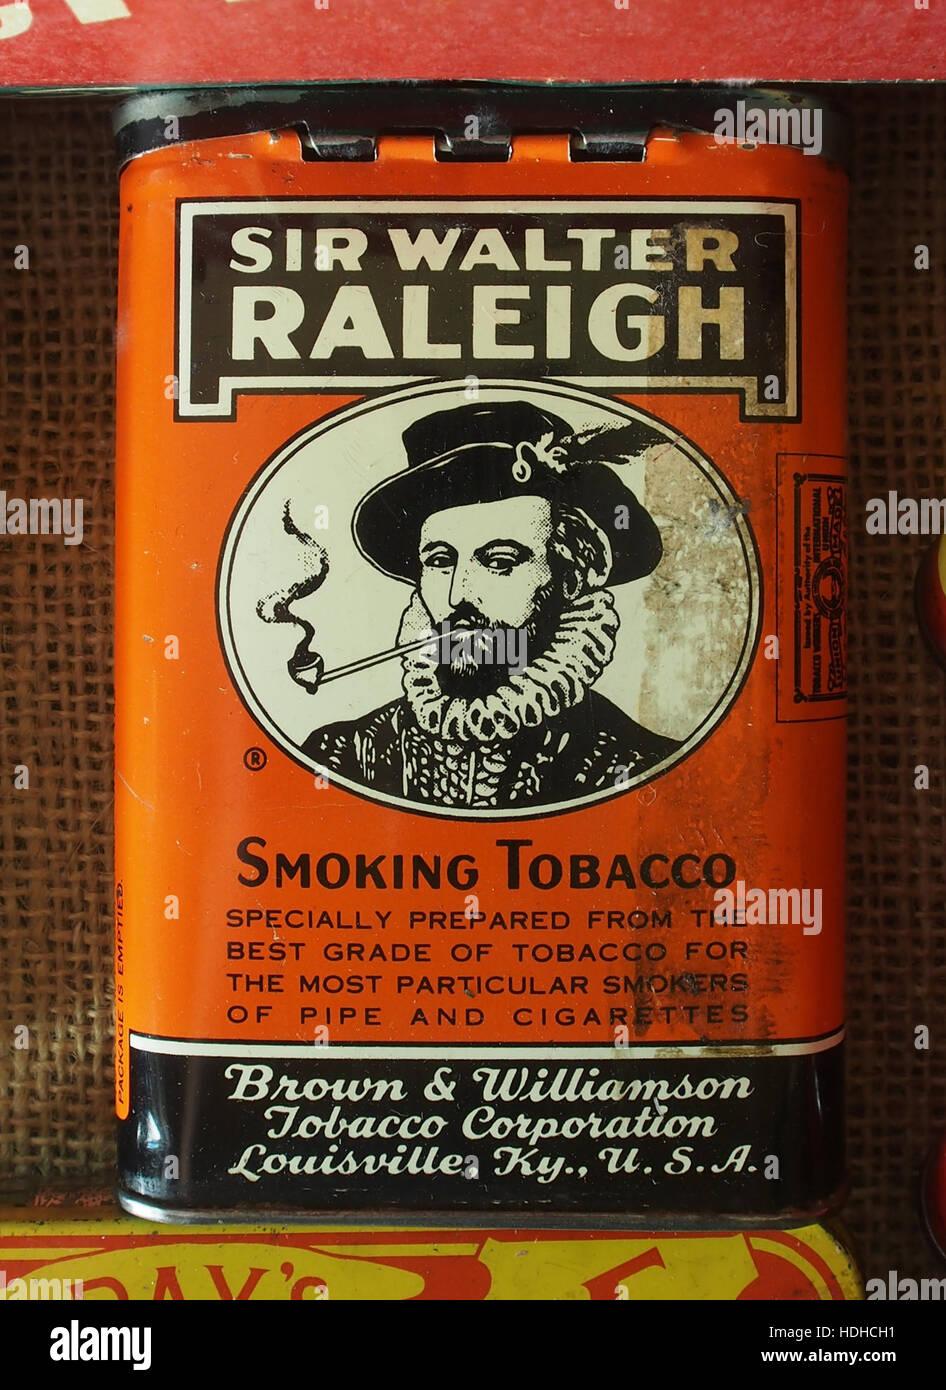 Bilderesultat for walter raleigh tobacco picture